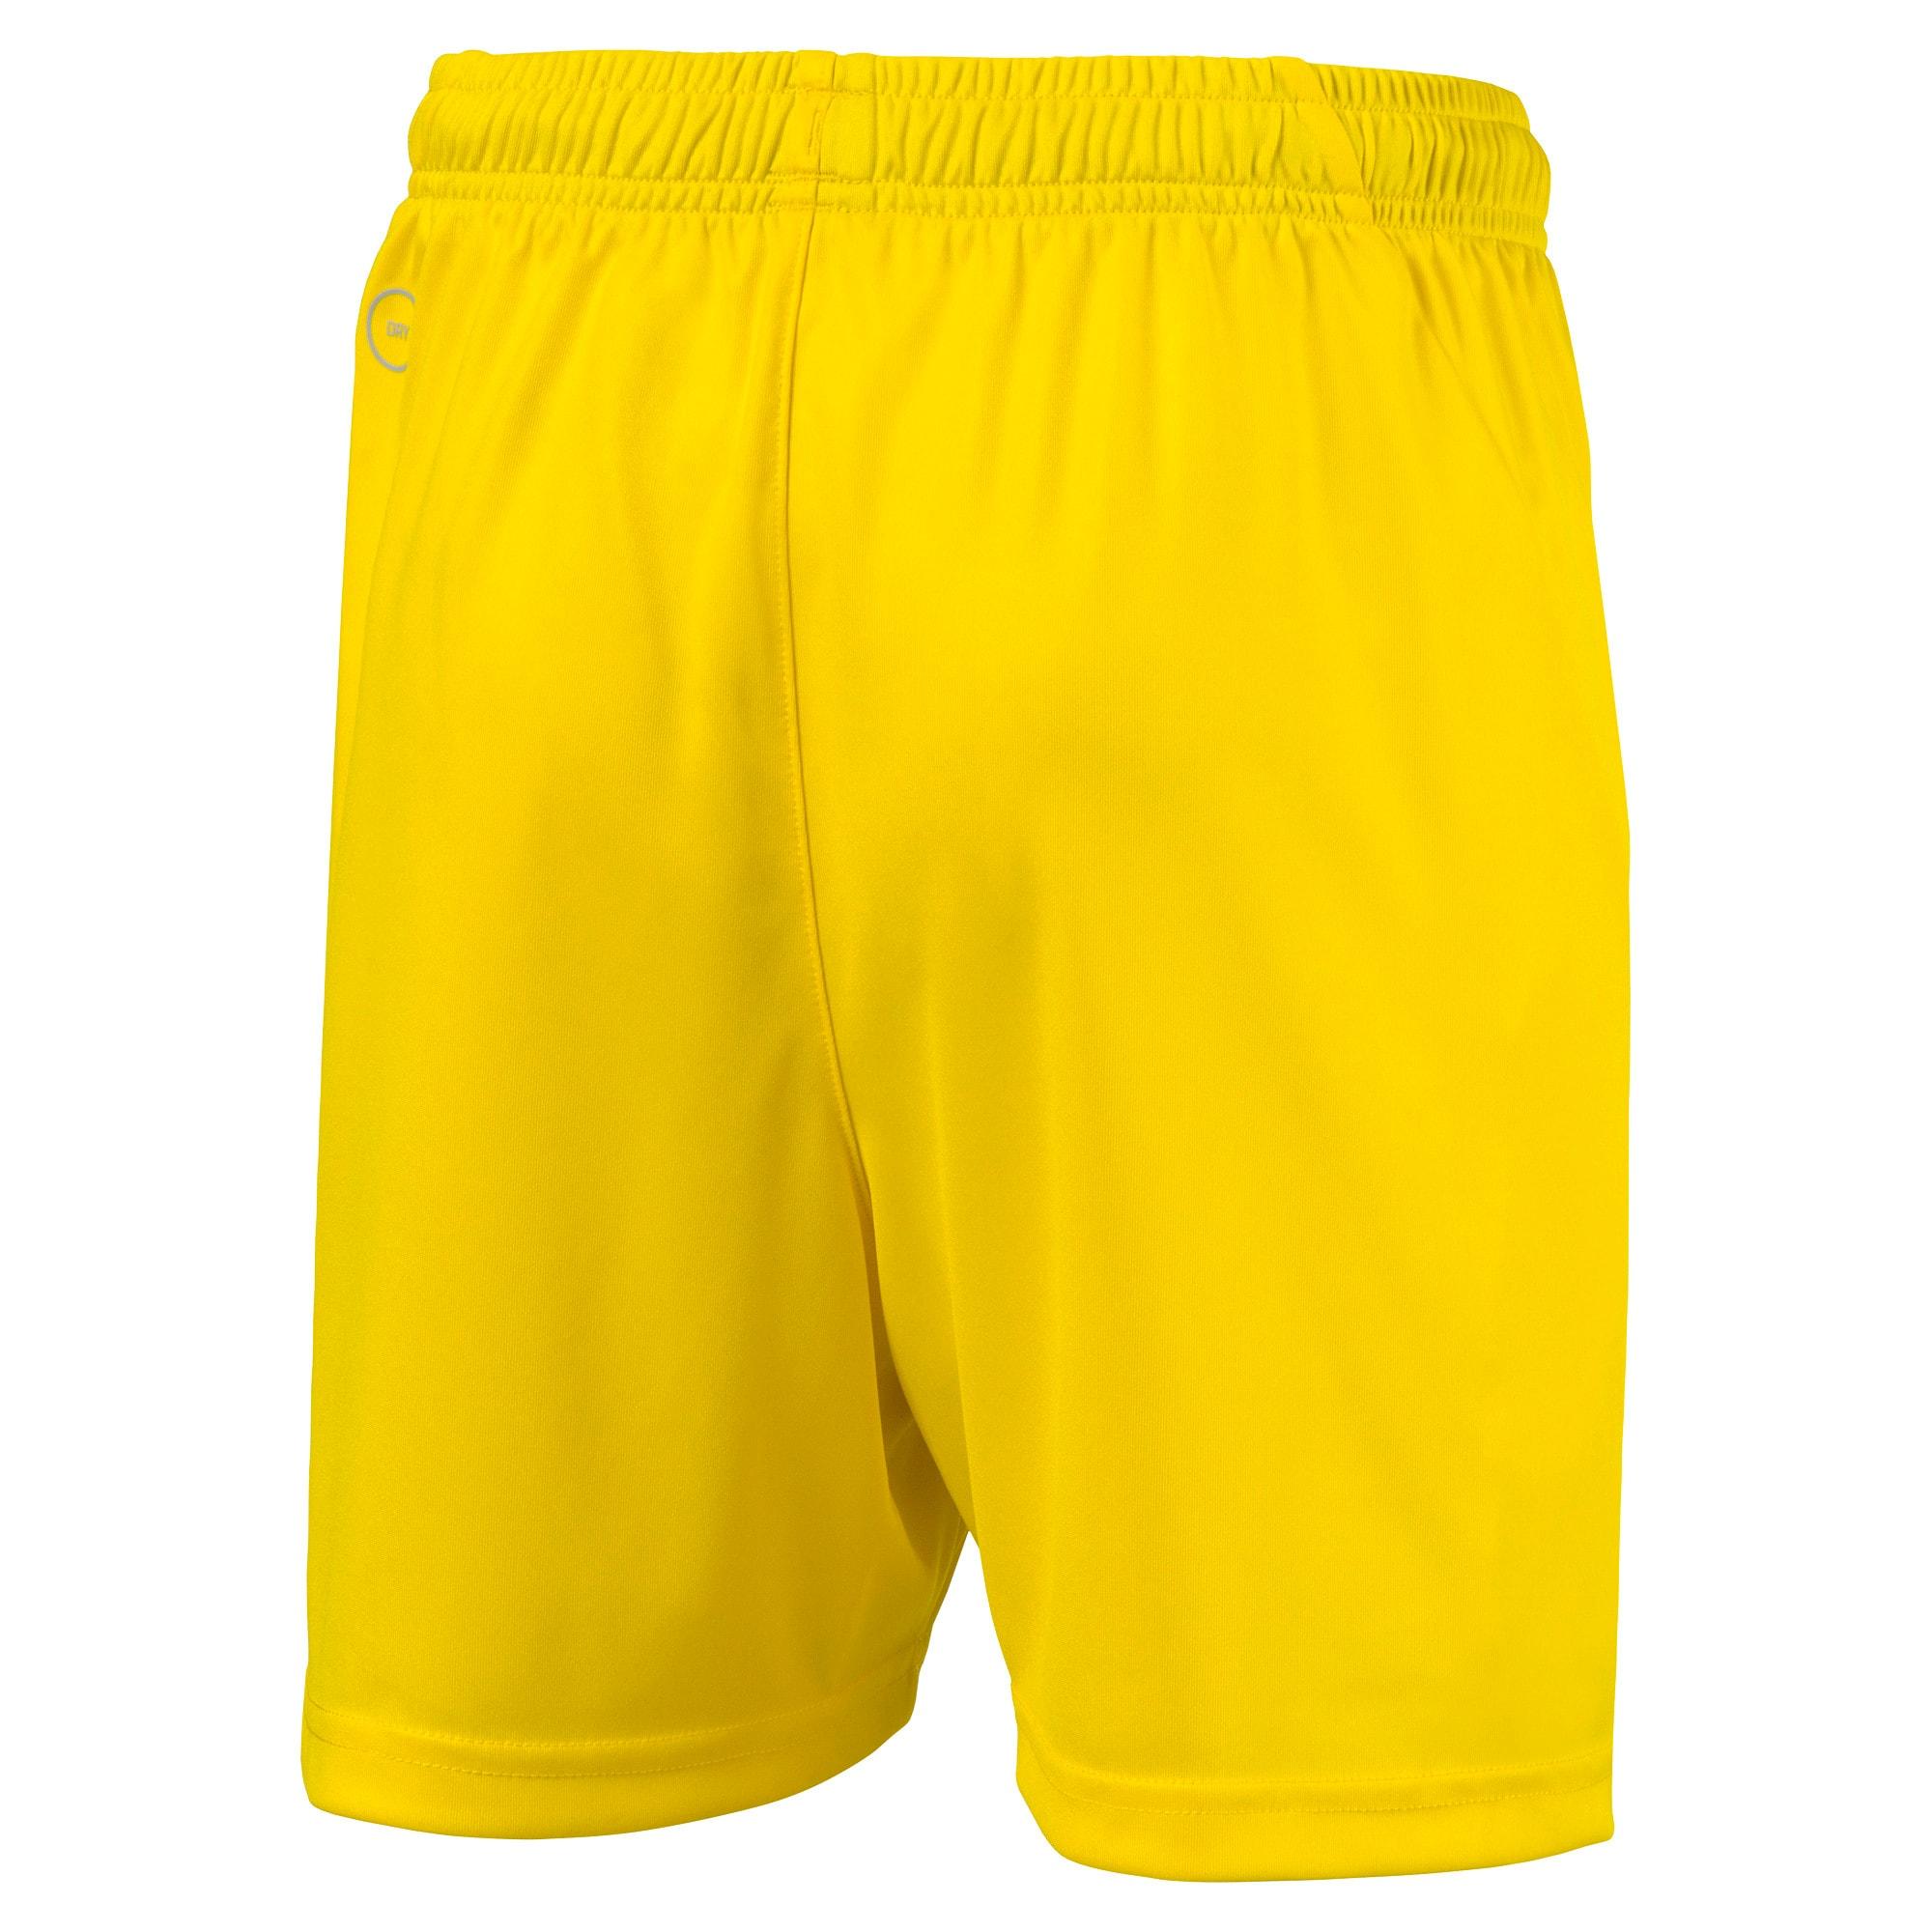 Thumbnail 2 of Liga Core Junior Football Shorts, Cyber Yellow-Puma Black, medium